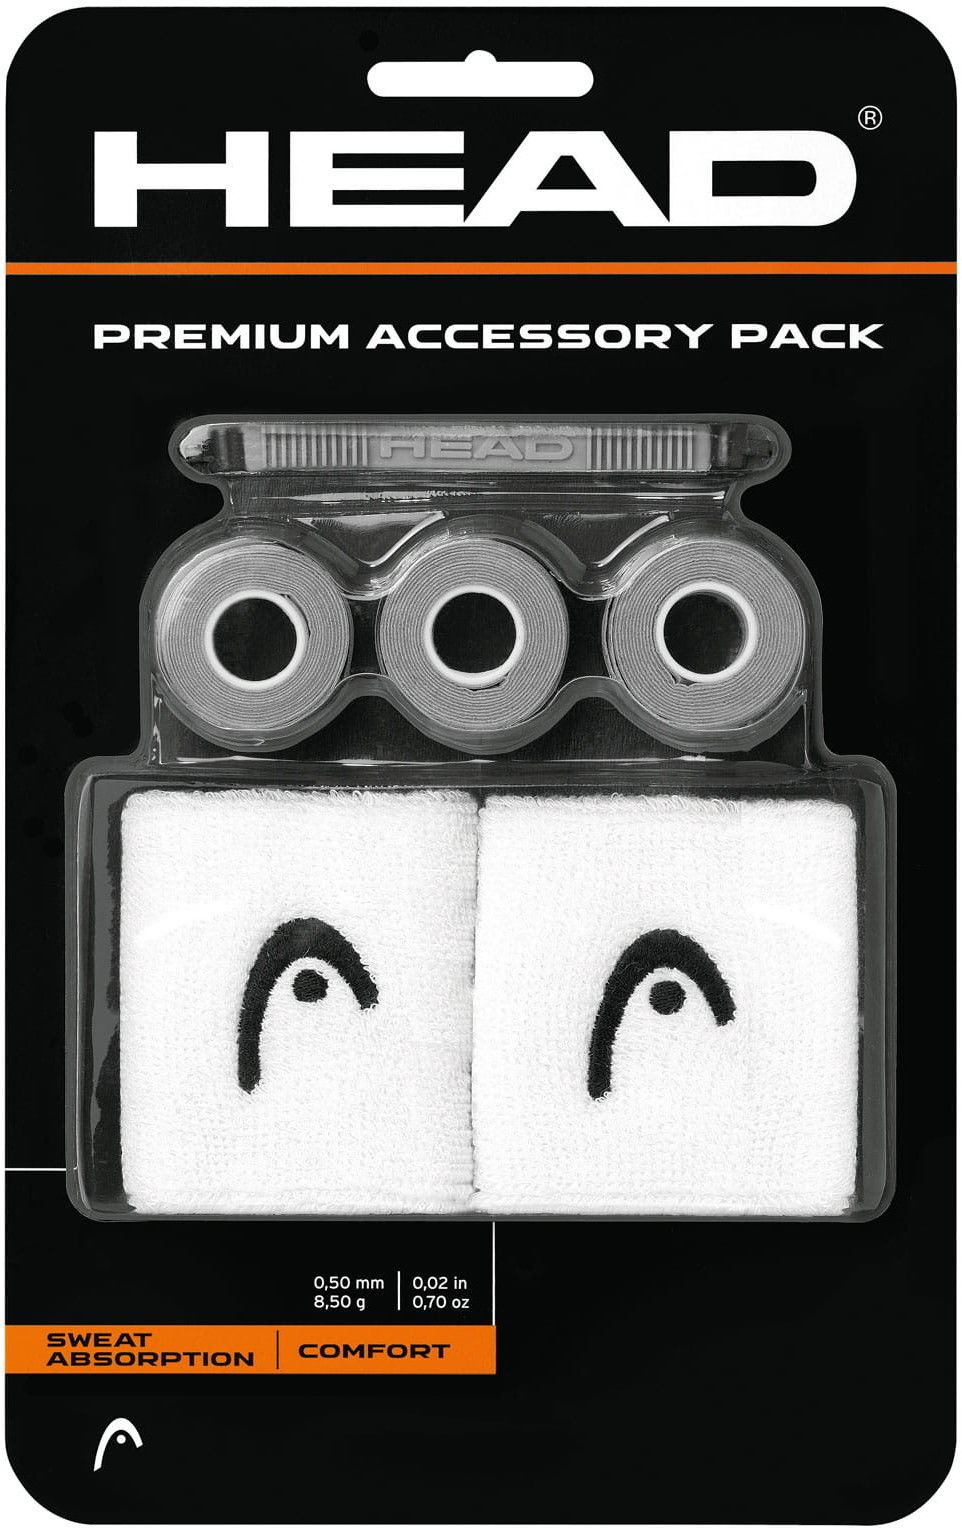 Head Zestaw Head New Premium Accesory Pack 285105-GR